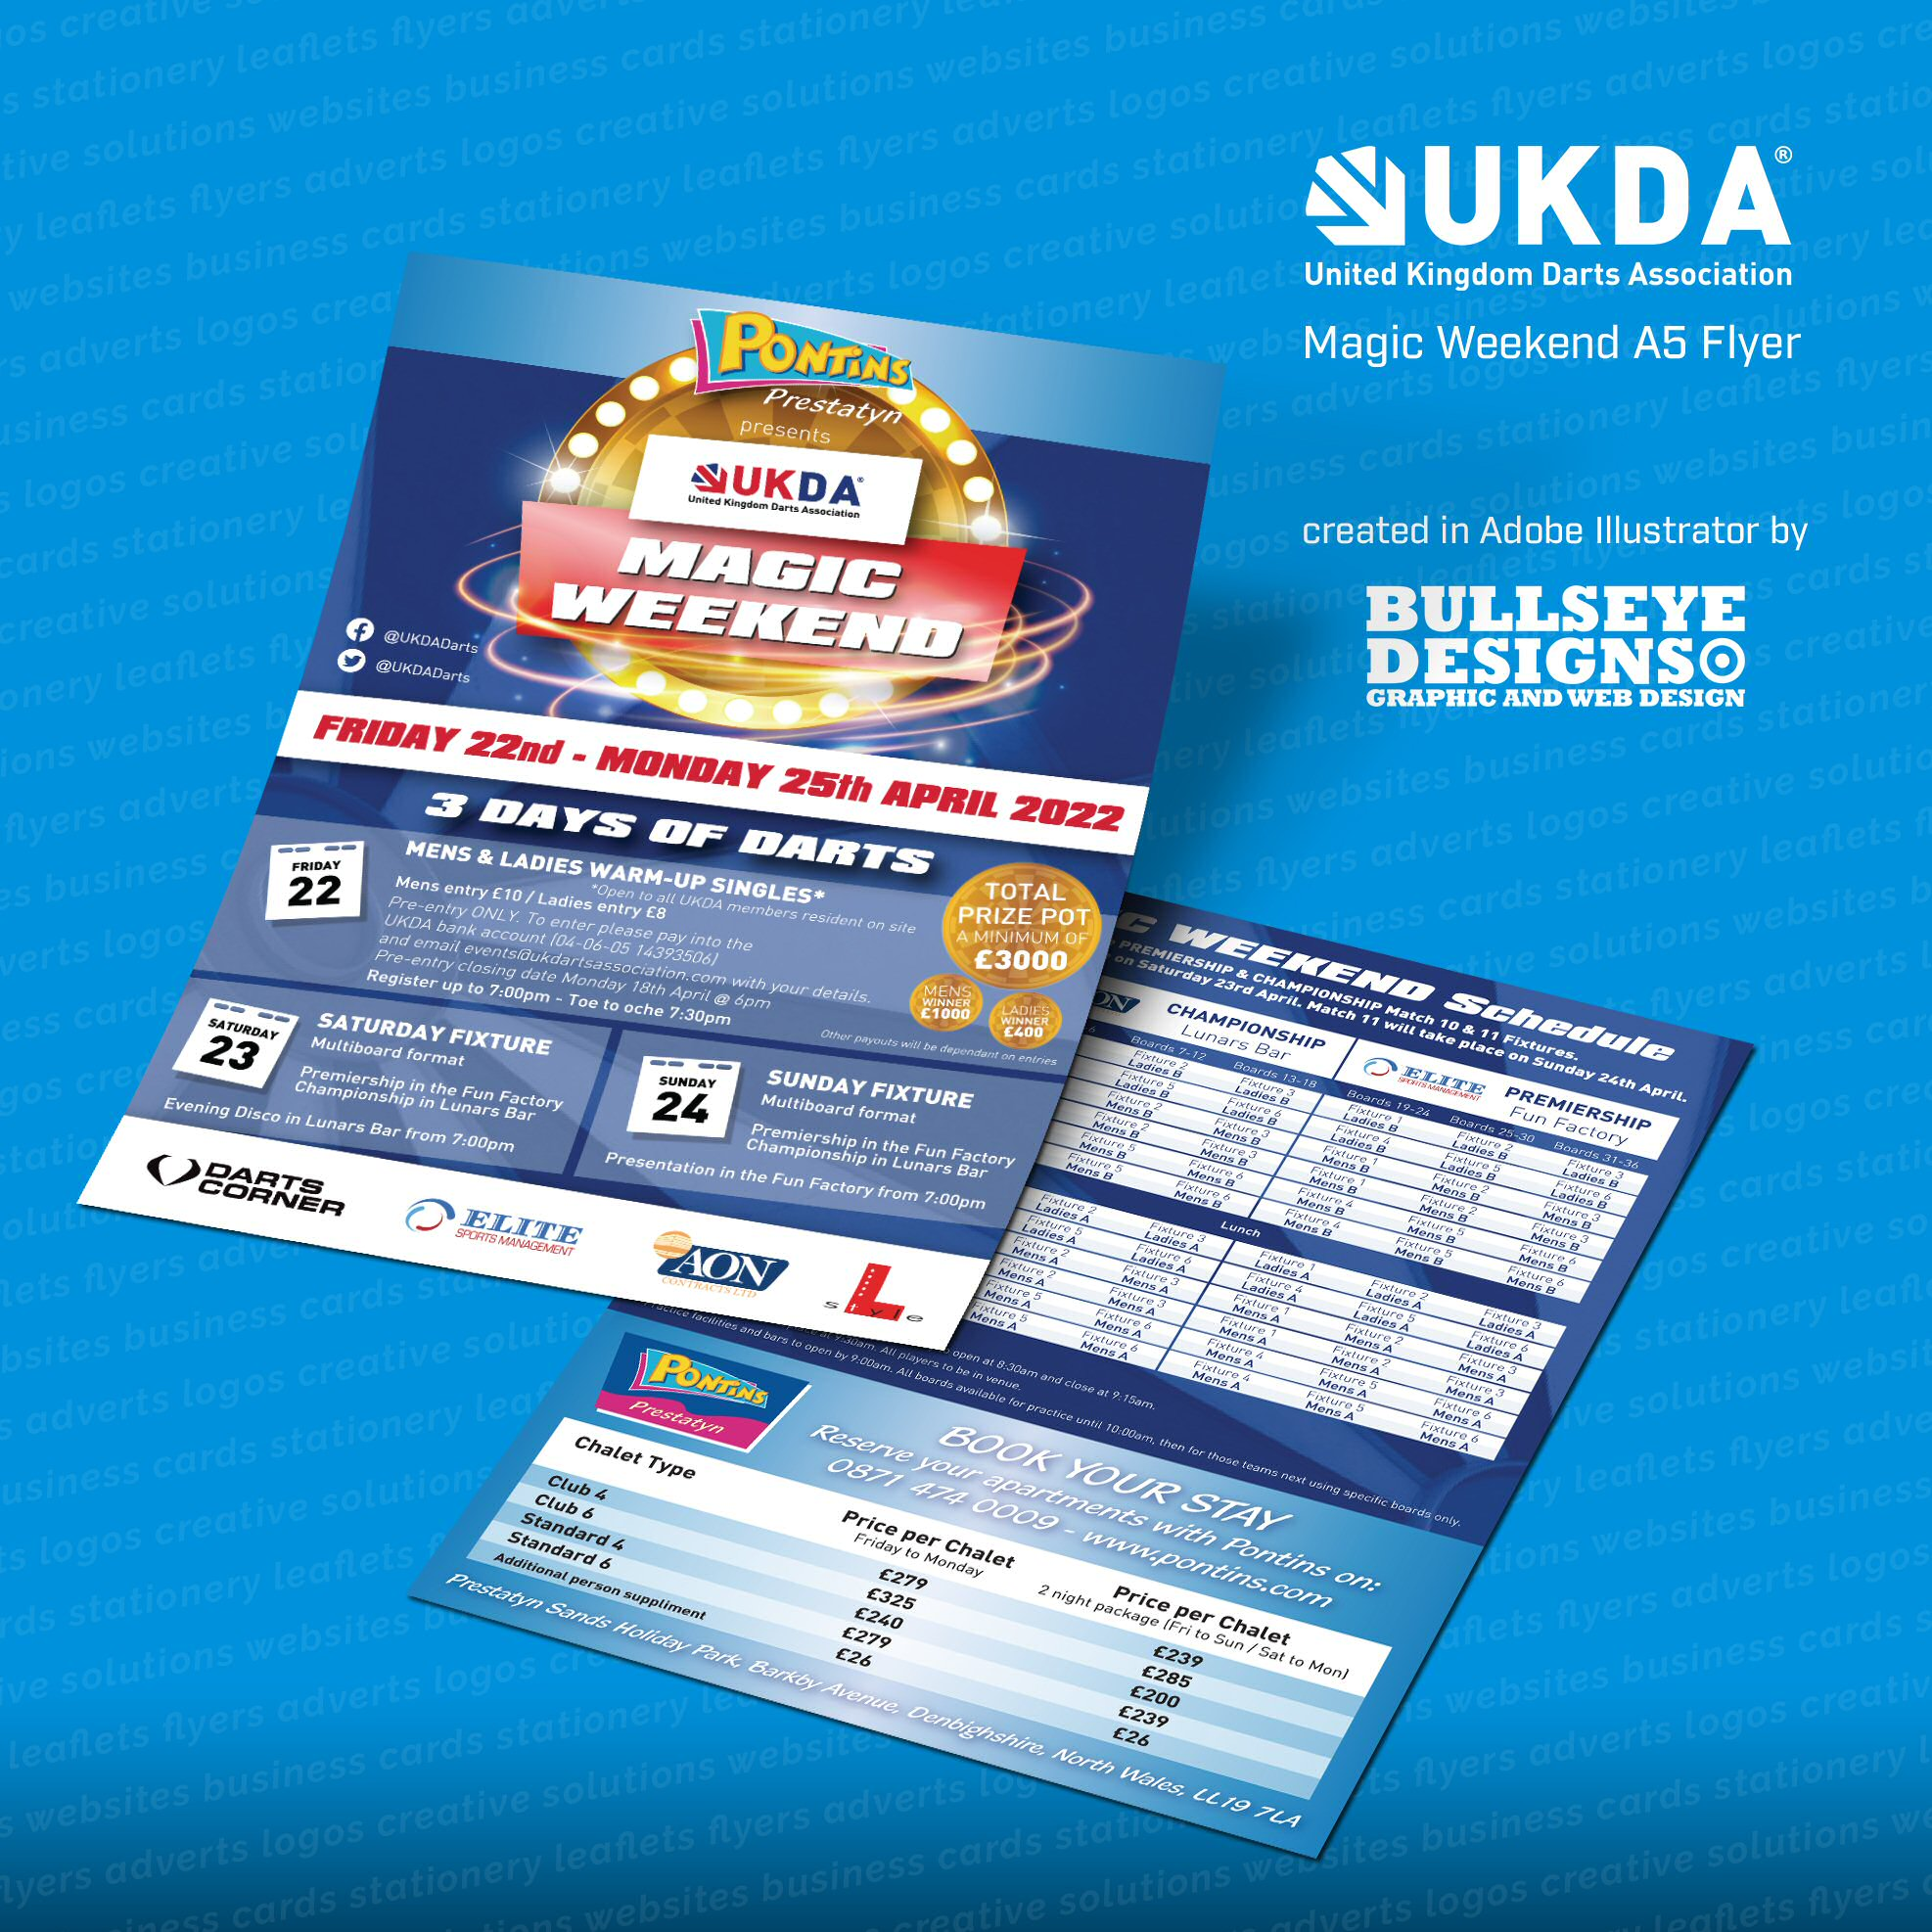 UKDA Magic Weekend Leaflet